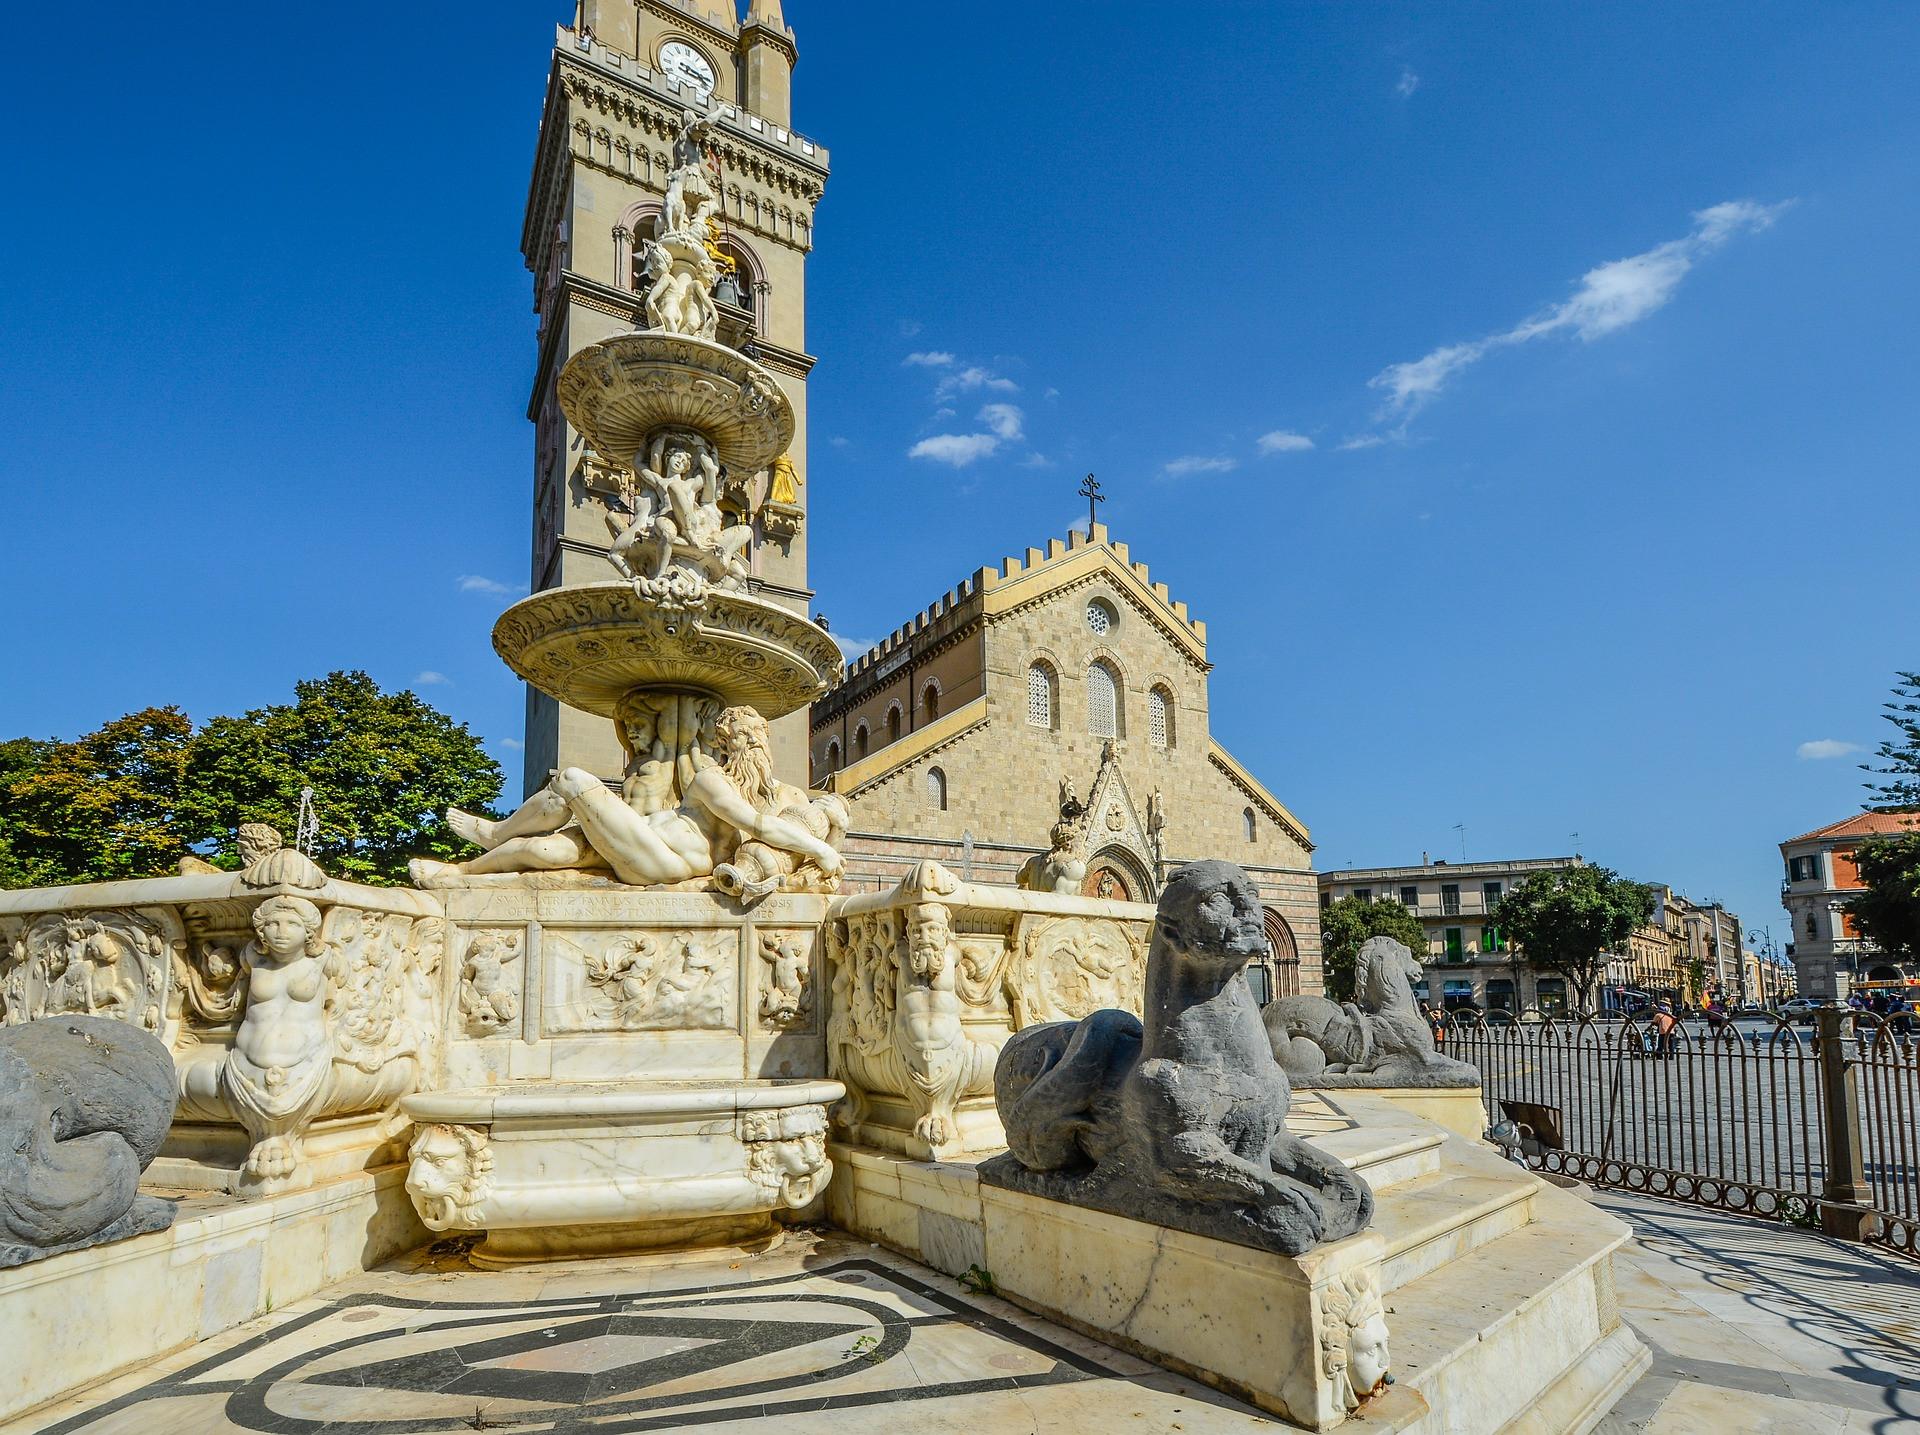 Plein met kathedraal in Messina